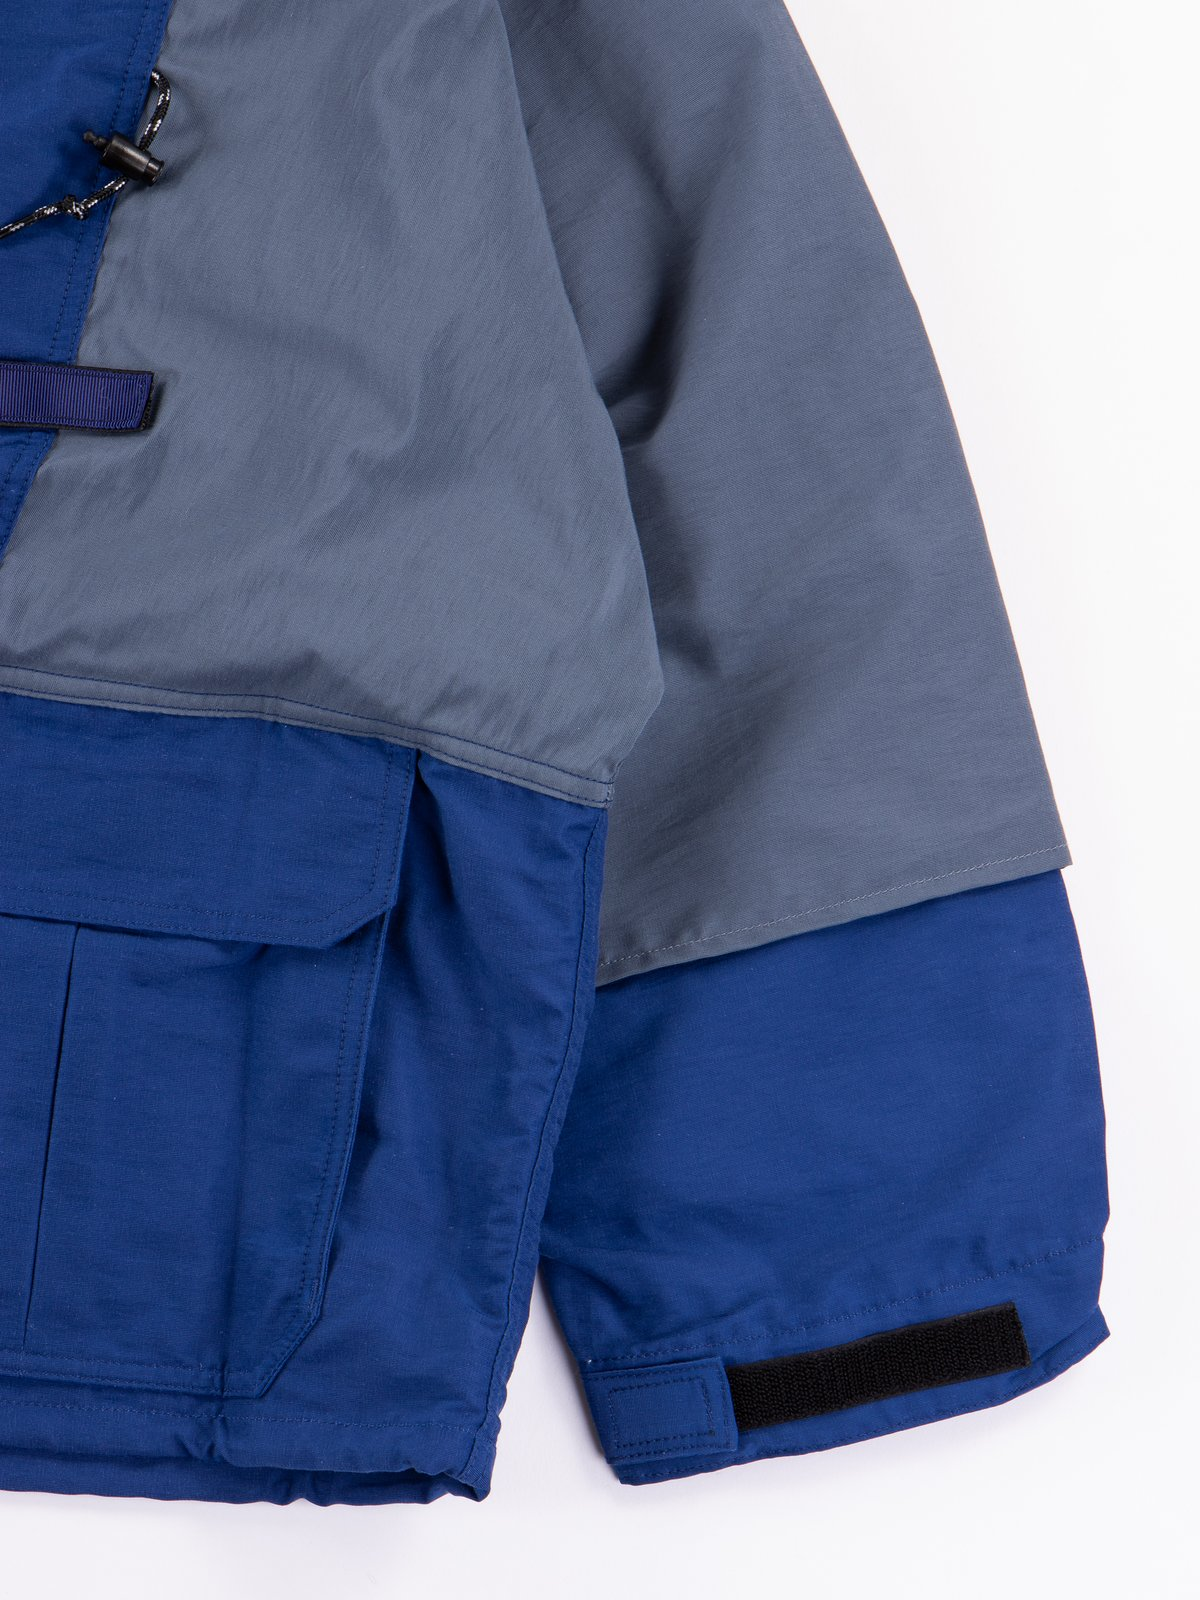 Navy 60/40 Cloth Kamakura Anorak Blouson - Image 6